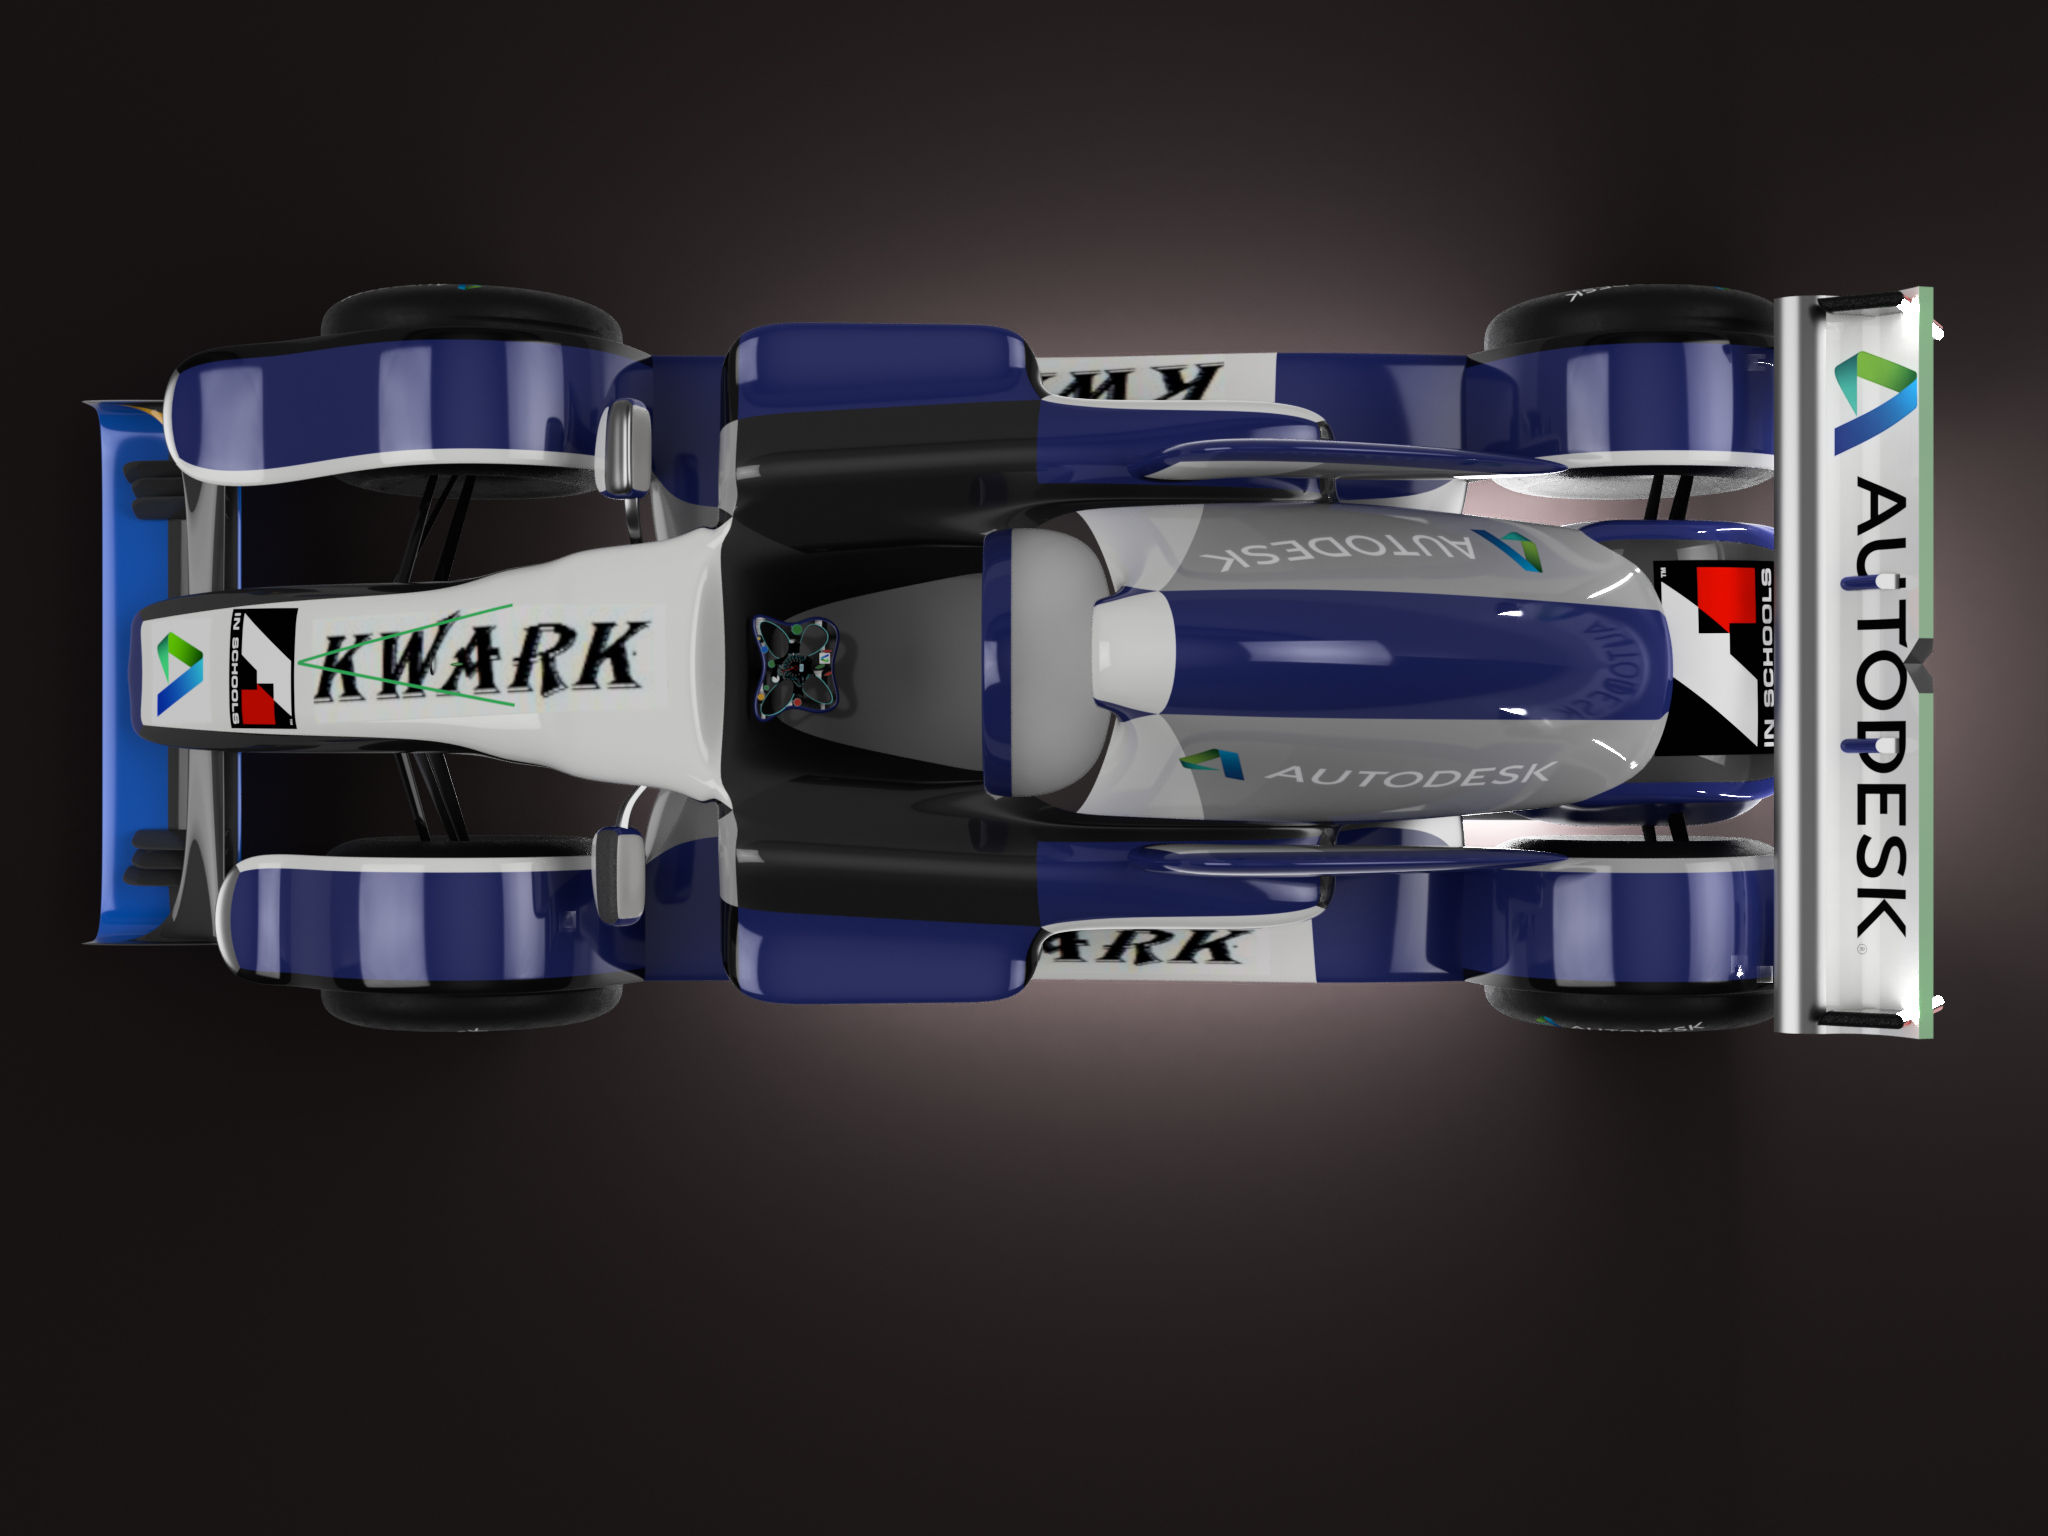 Keark-t-3500-3500